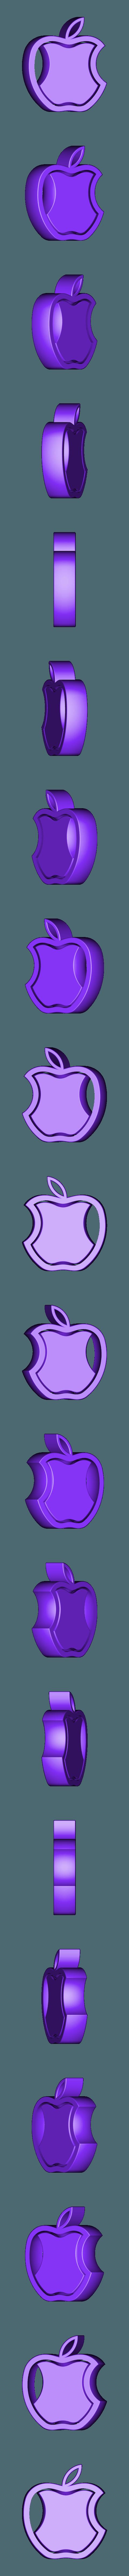 logo_apple.stl Download free STL file APPLE logo - pendant • 3D print template, NOP21